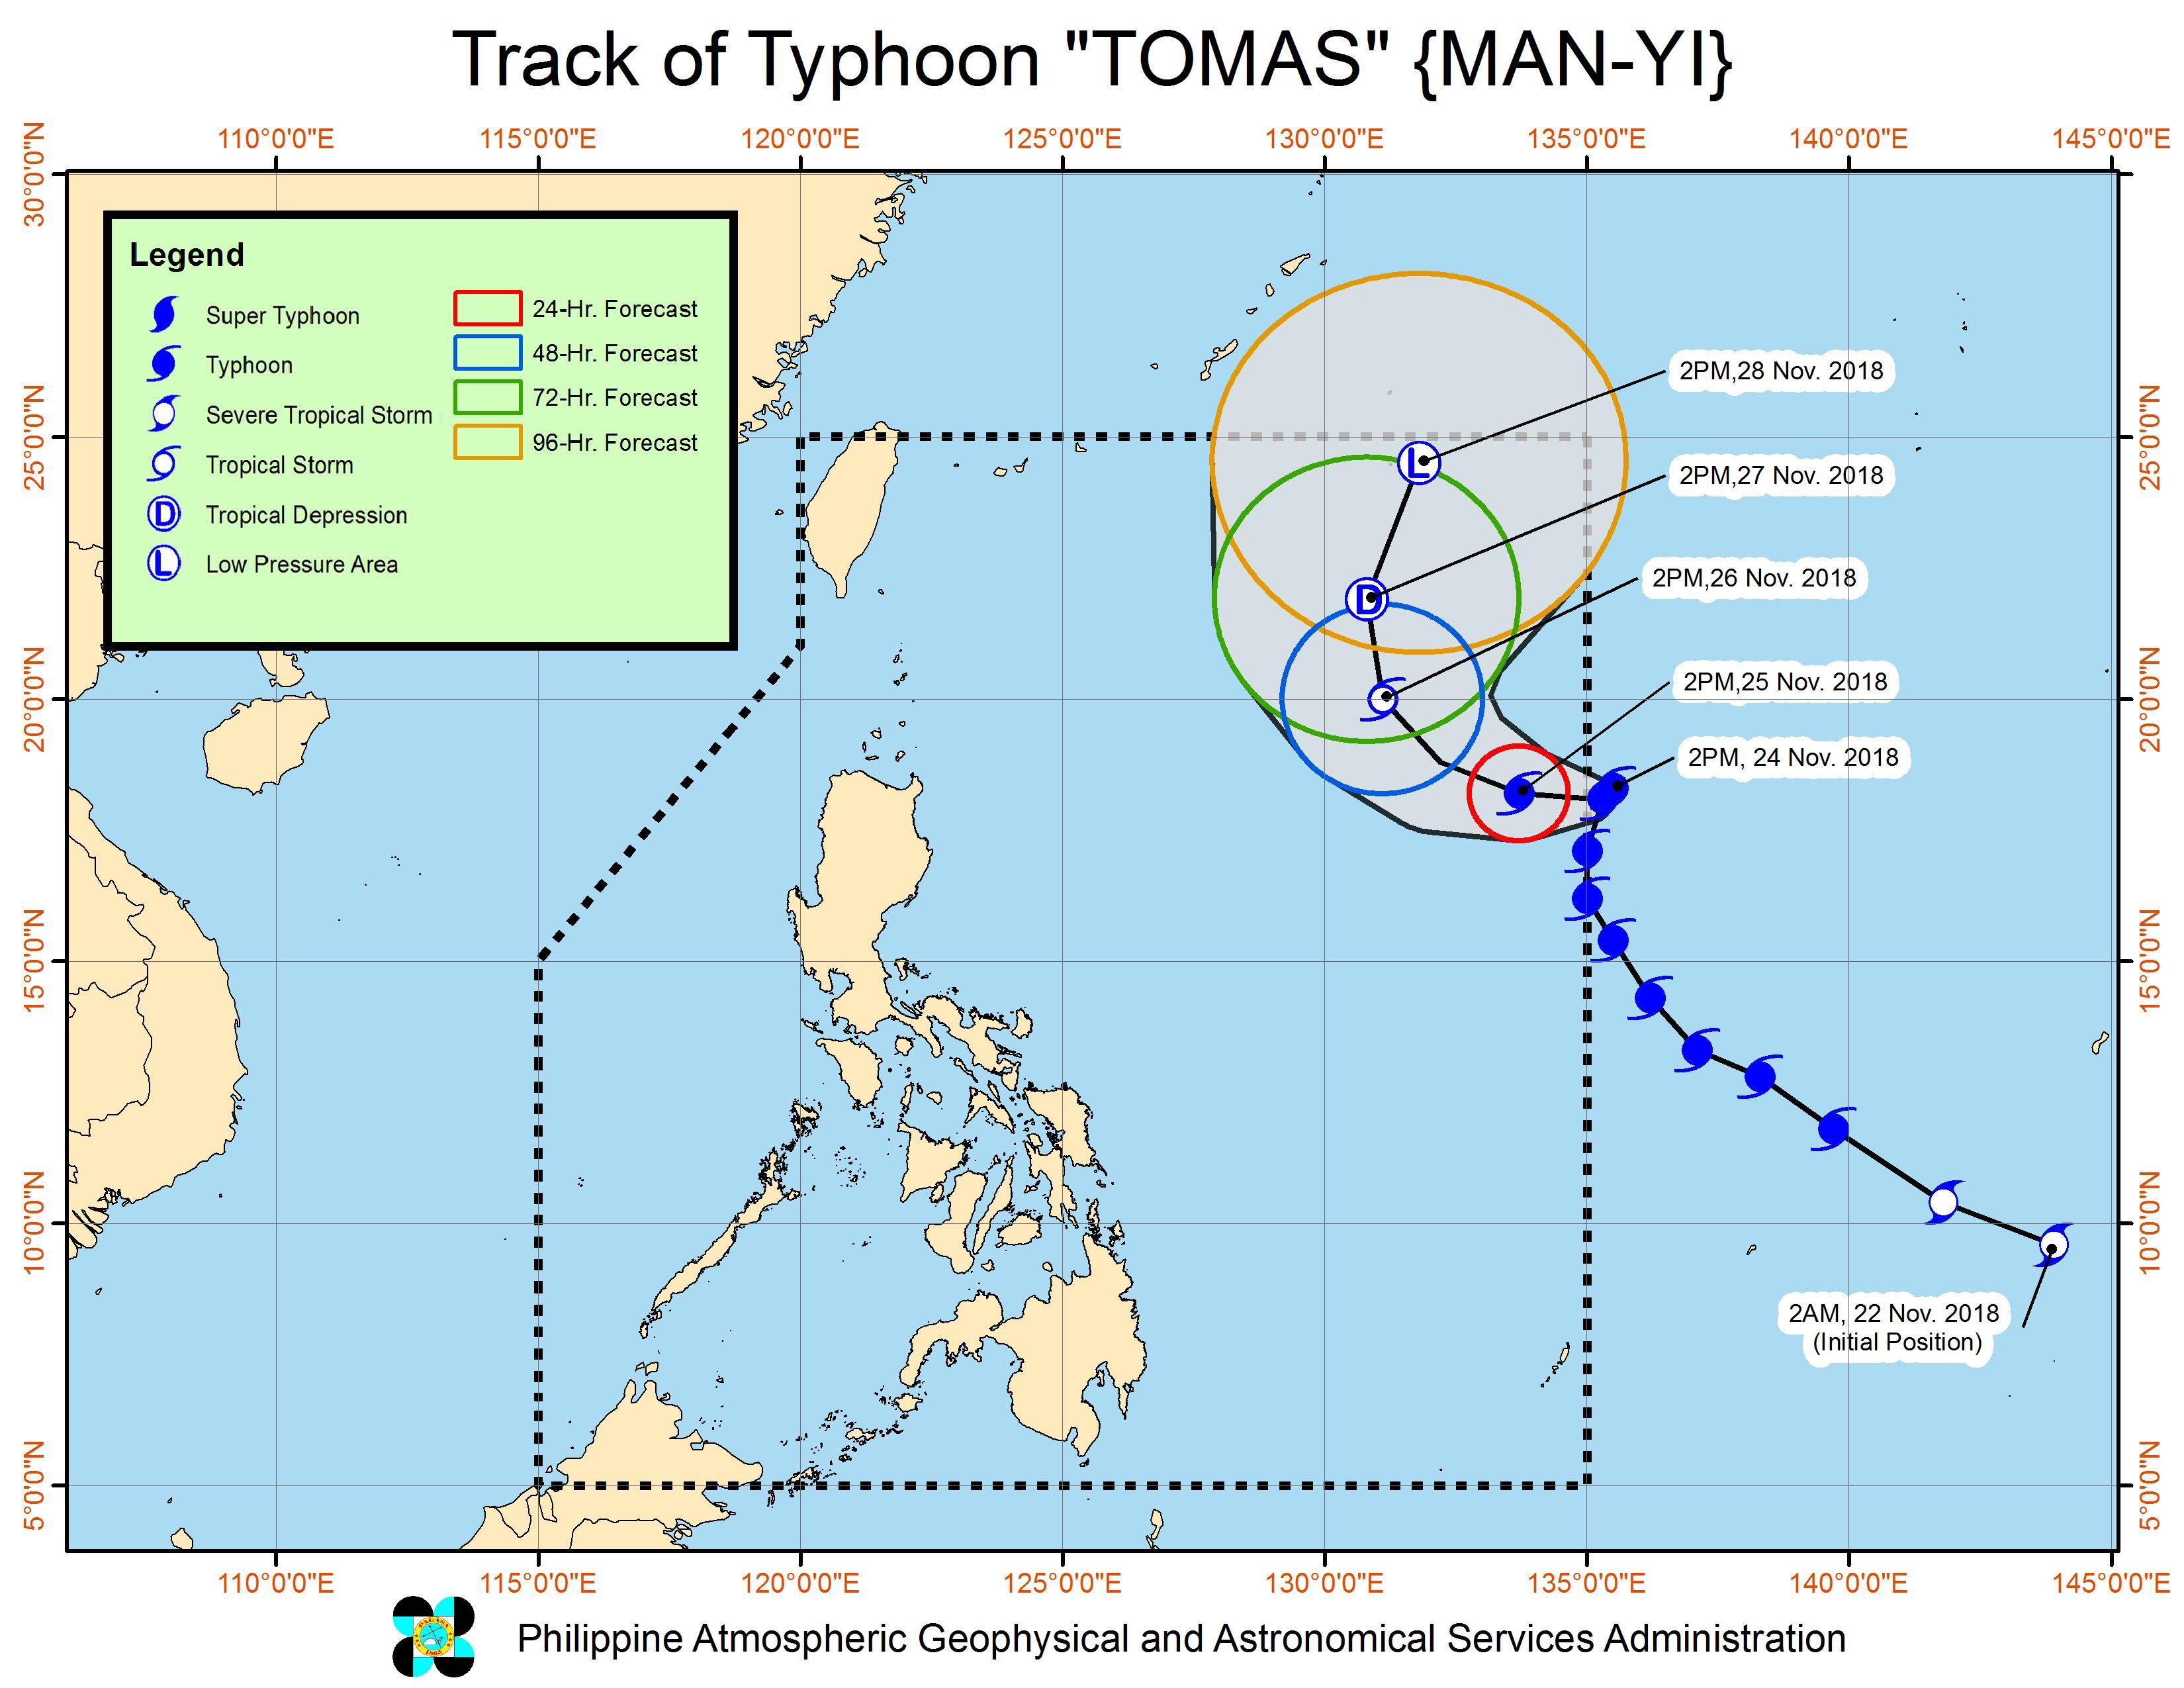 Forecast track of Typhoon Tomas (Man-yi) as of November 24, 2018, 4 pm. Image from PAGASA